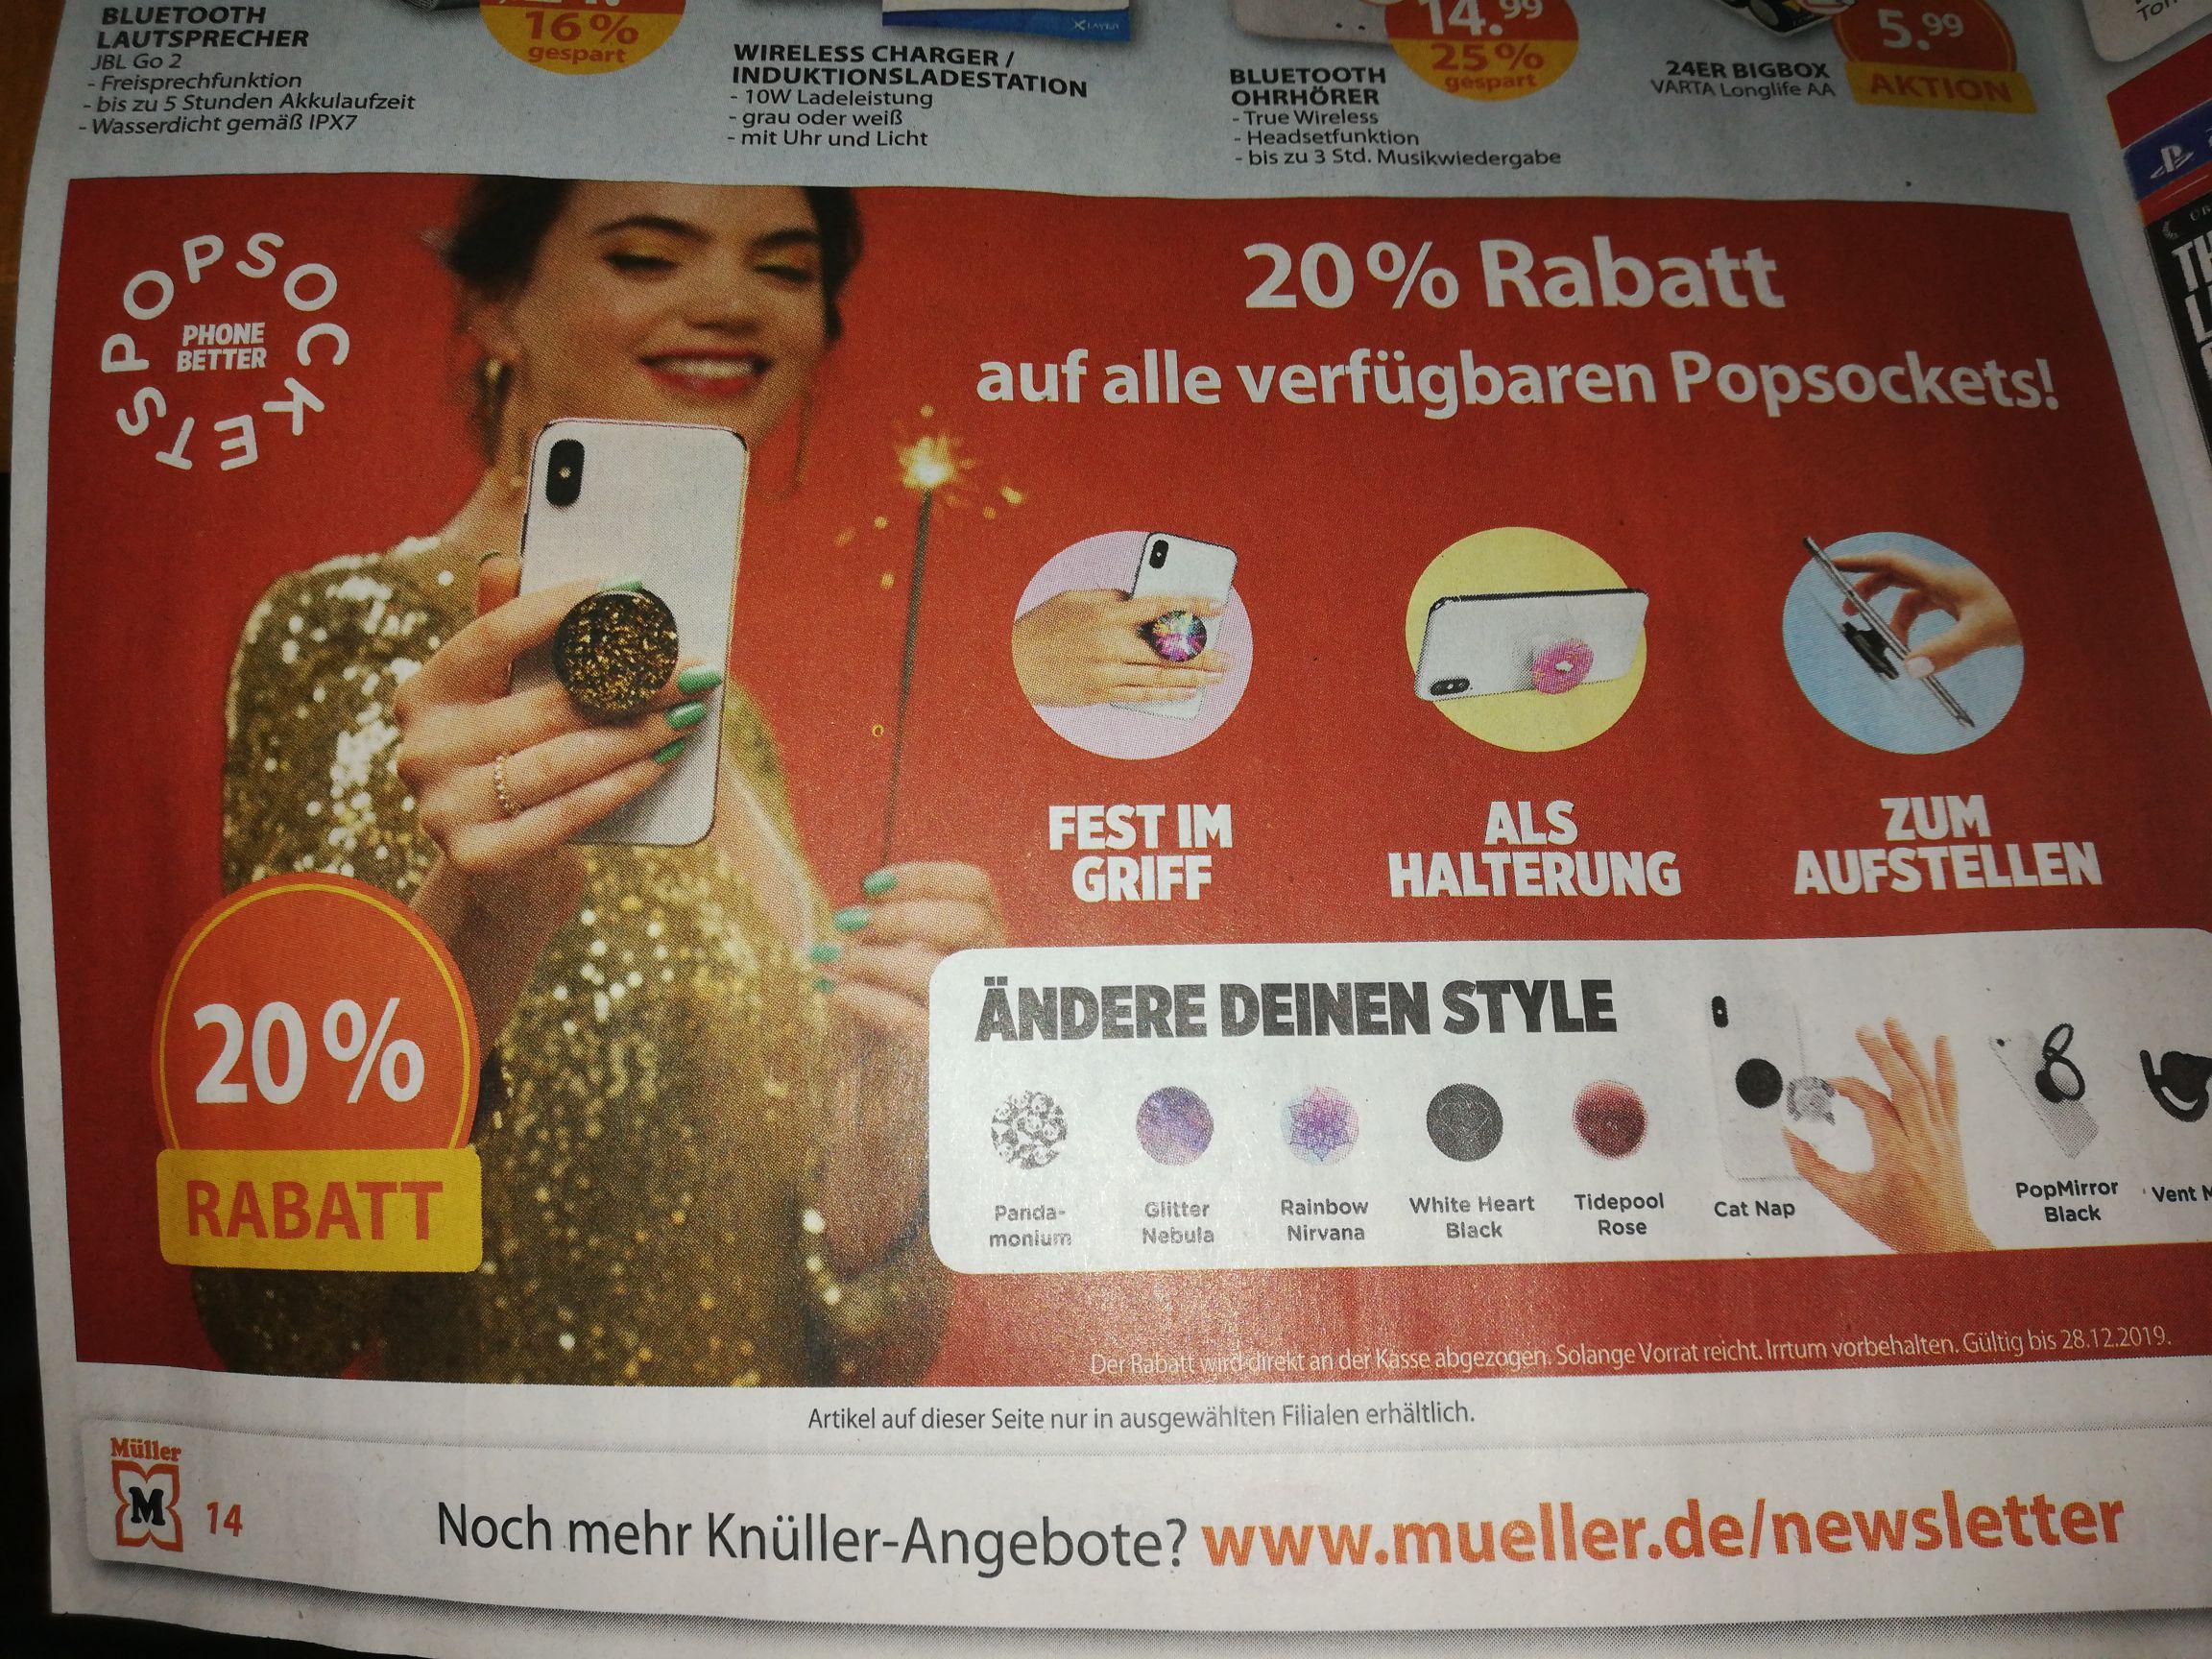 20% Rabatt auf alle verfügbaren Popsockets bei Müller